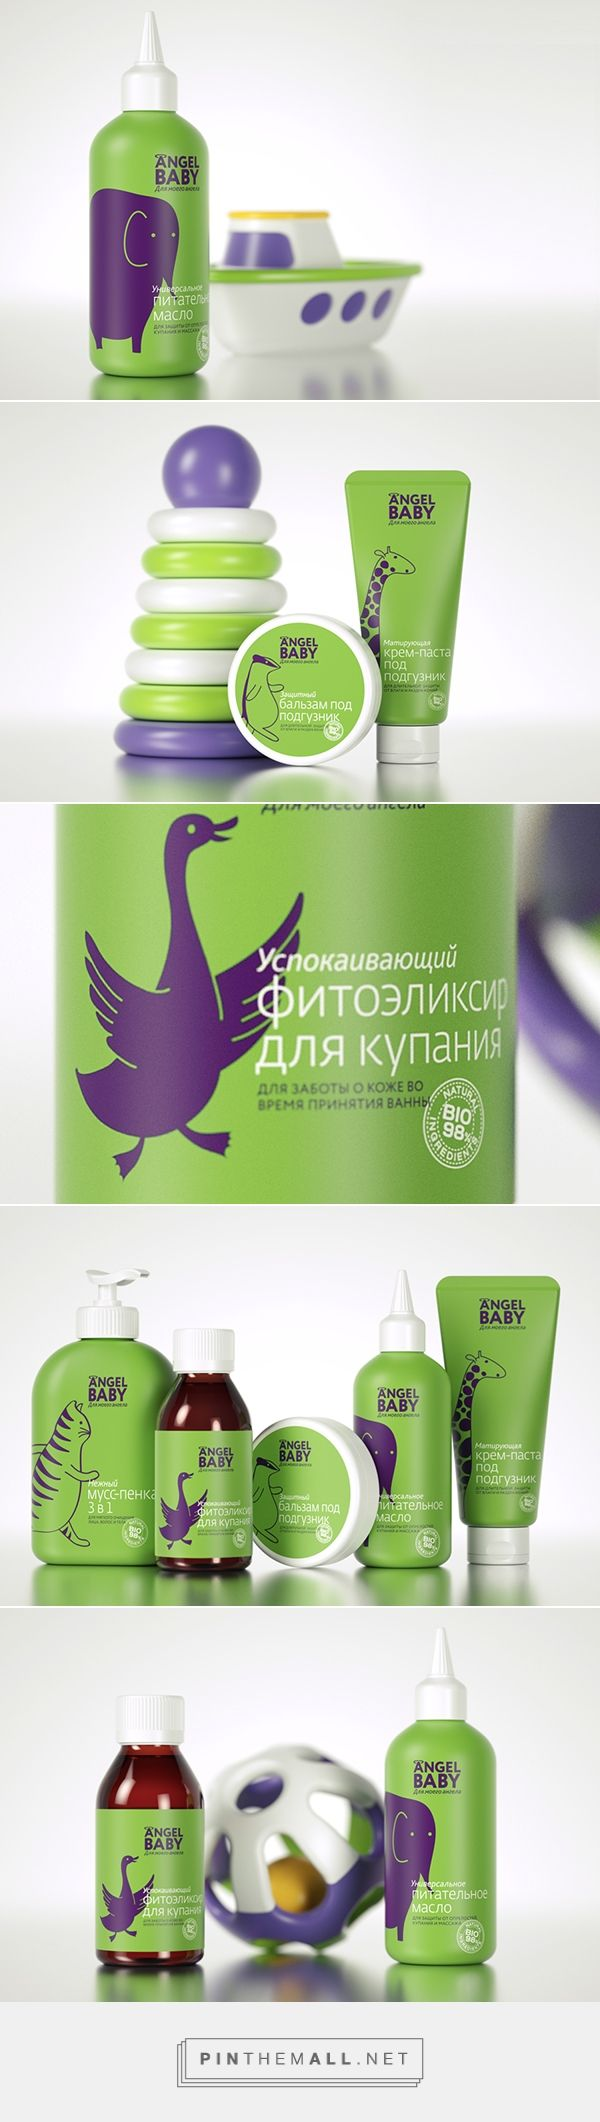 "Cosmetics packaging ""Angel Baby"" /  Ohmybrand branding studio"